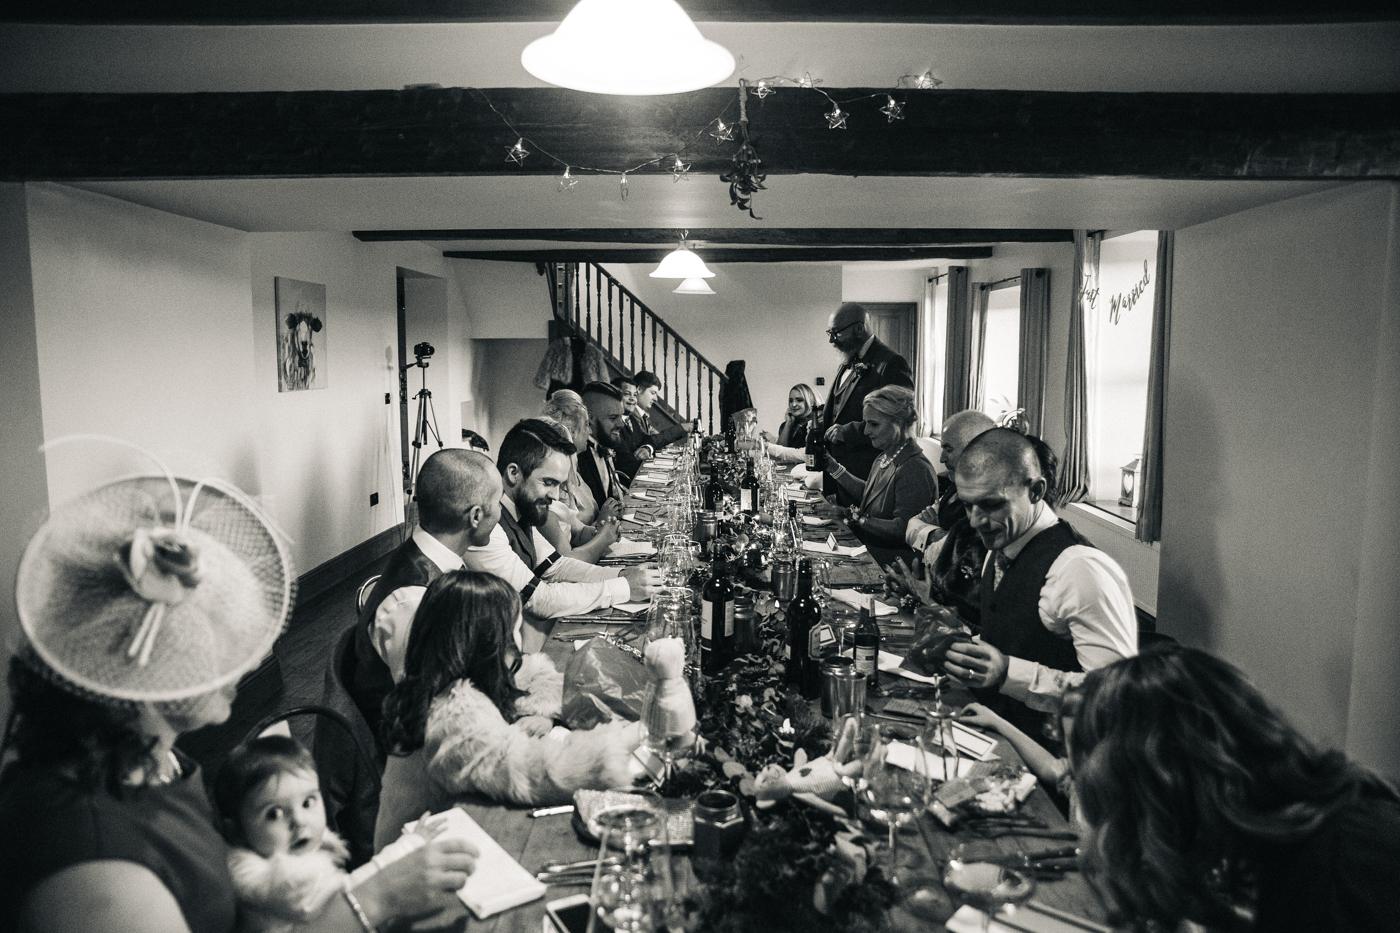 new-hall-farm-wolsingham-durham-wedding-photographer-0030.jpg